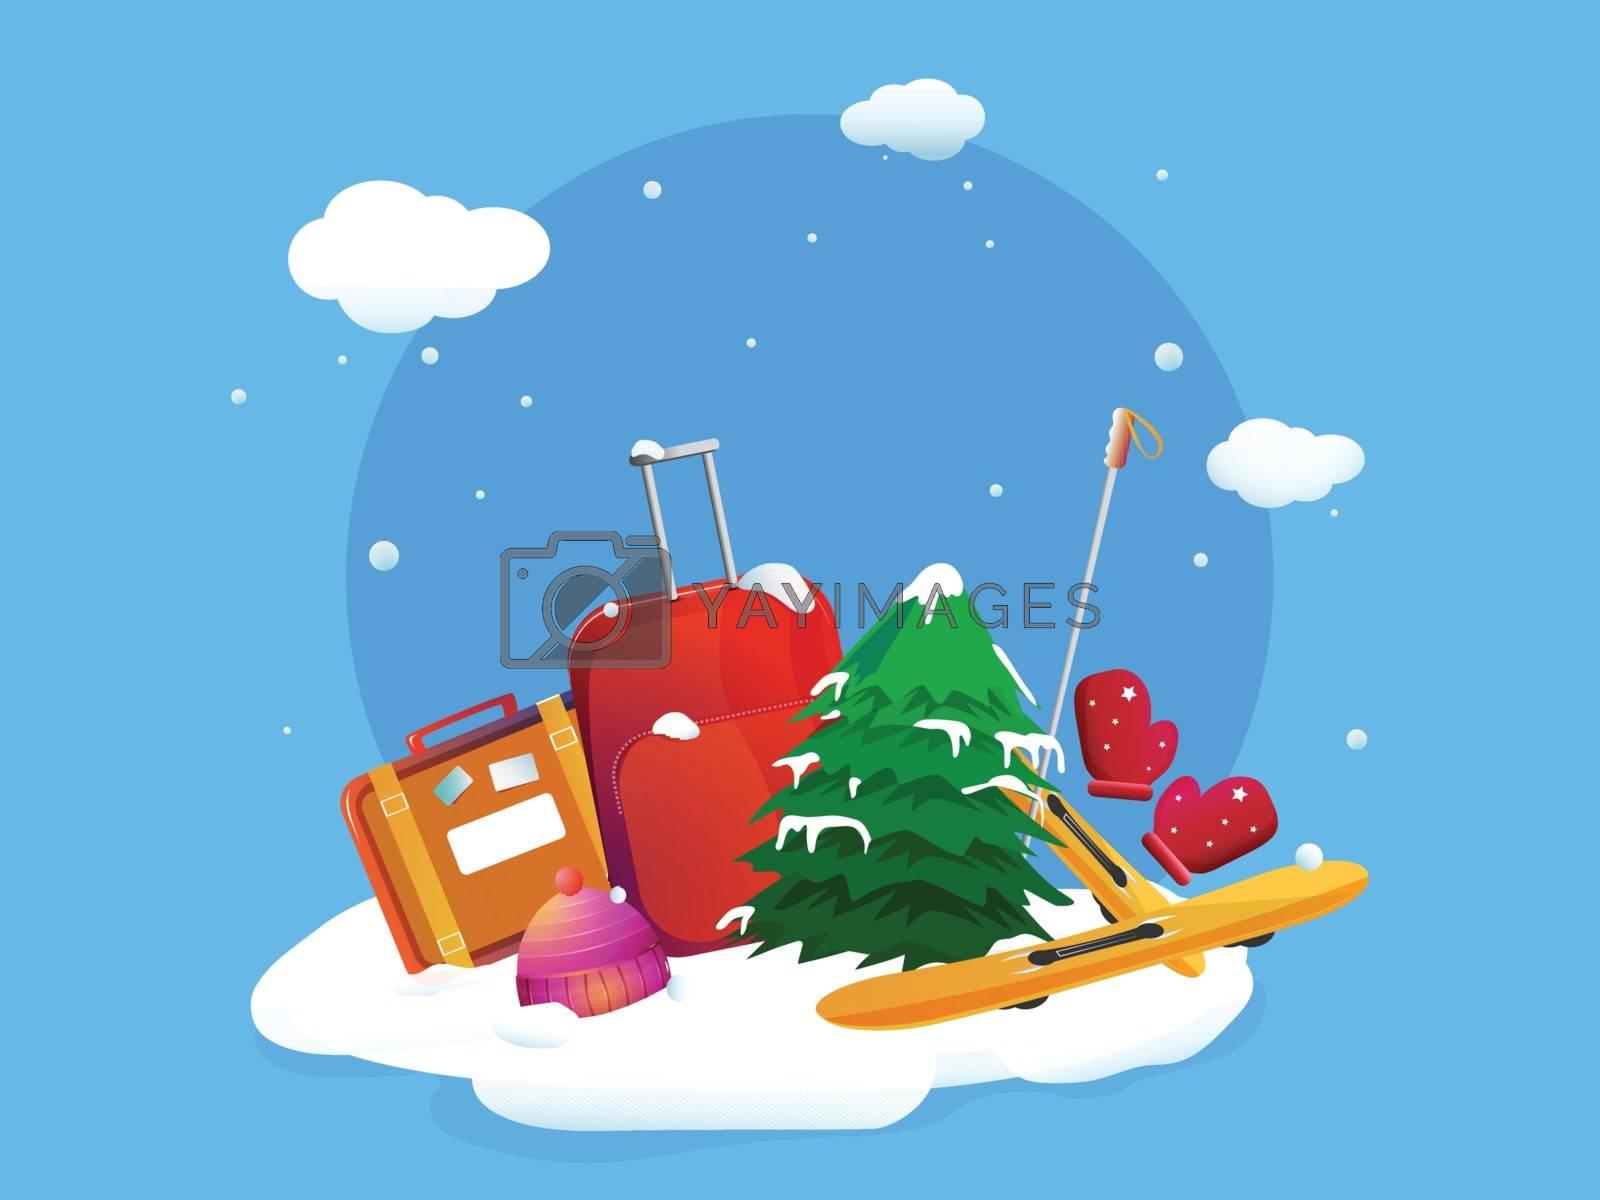 Illustration of backpack, xmas tree and skateboard on blue background. Winter Vacation celebration greeting card design.